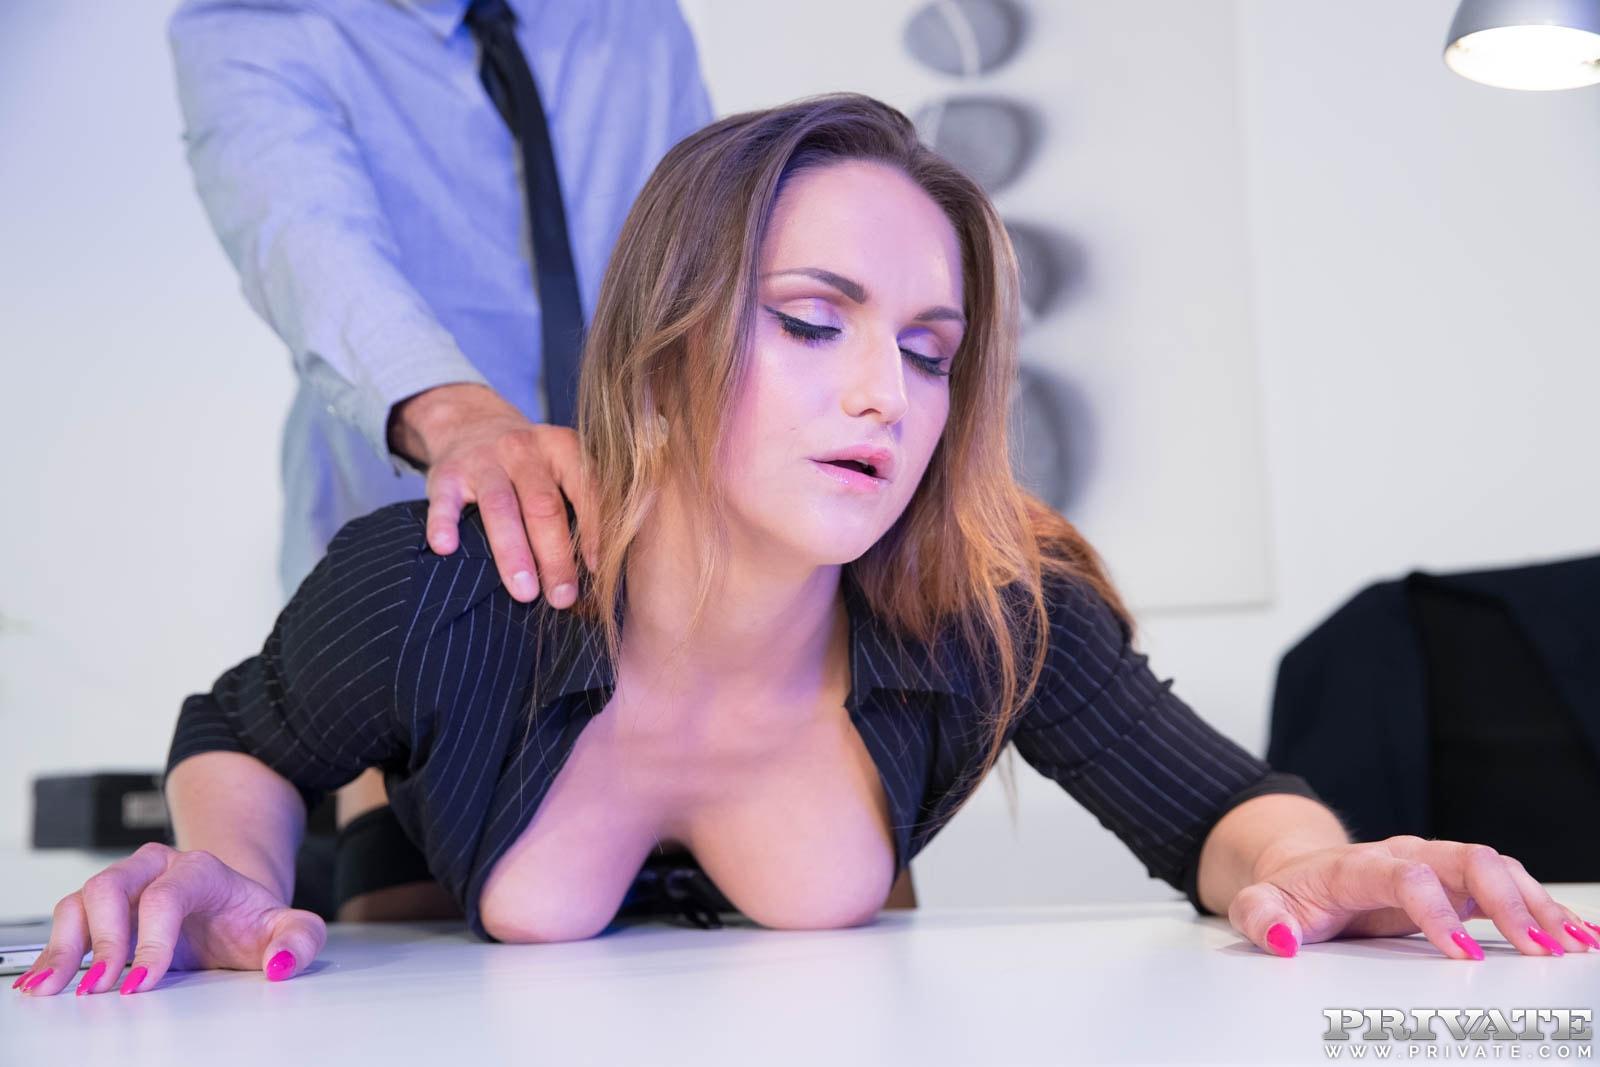 Privatecom barbara bieber puts the squeeze on her boss - 1 10